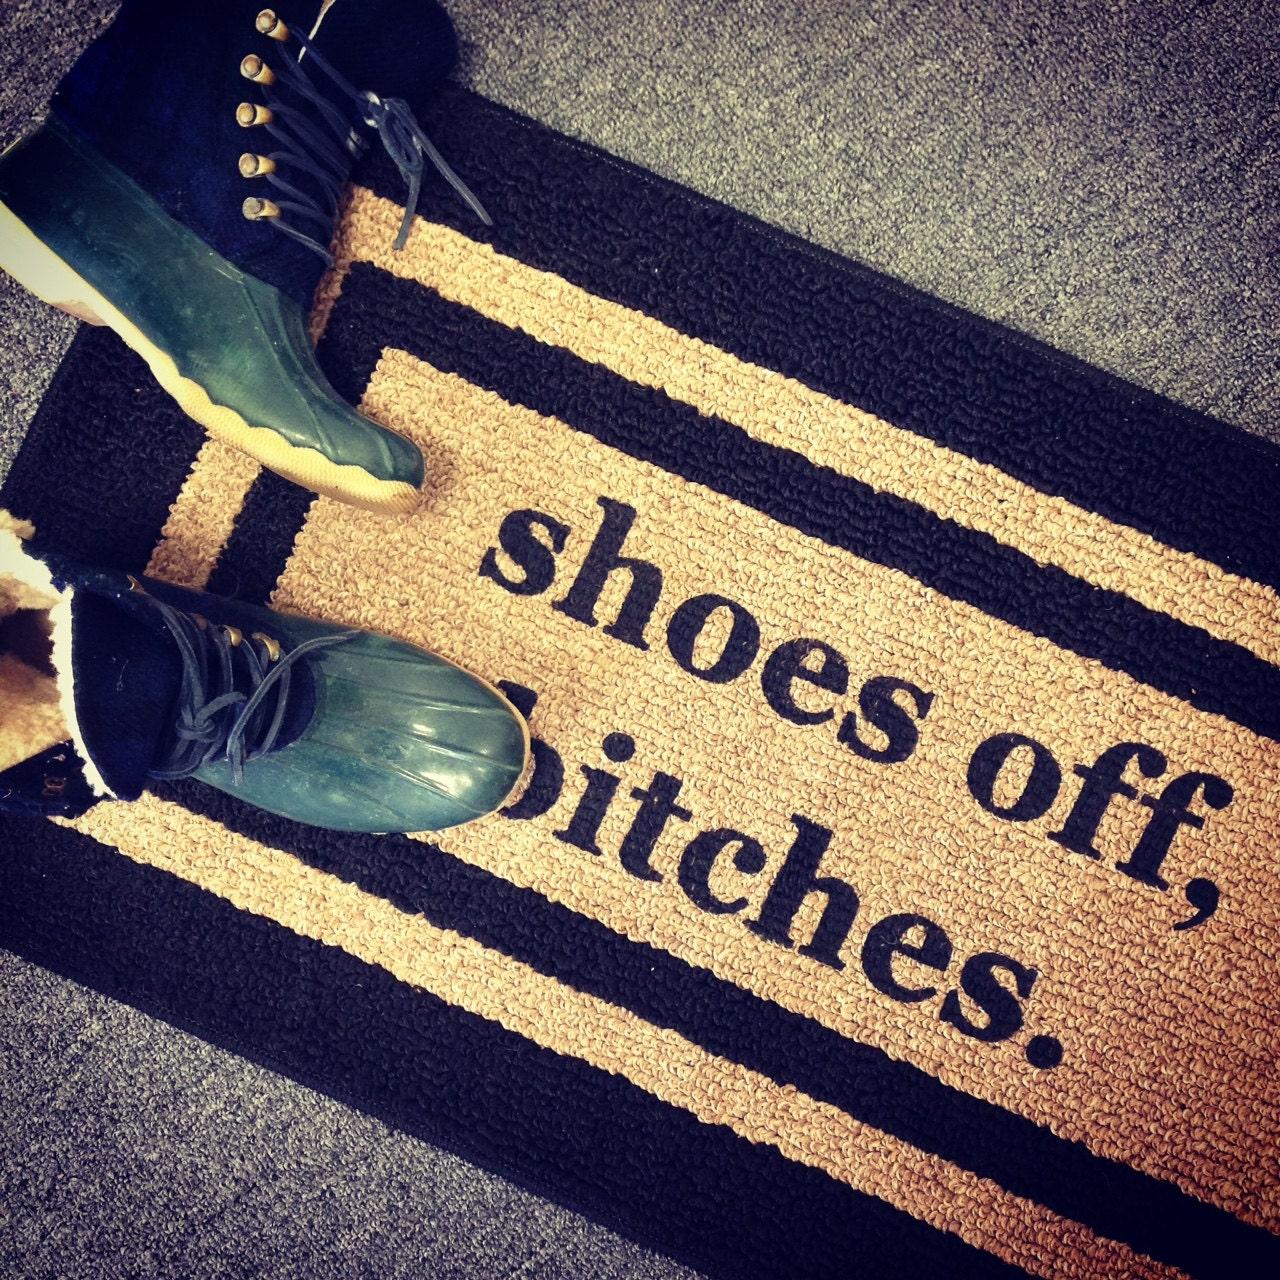 Doormat please remove shoes doormat images : Shoes Off Bitches® Decorative Door mat Area Rug Funny